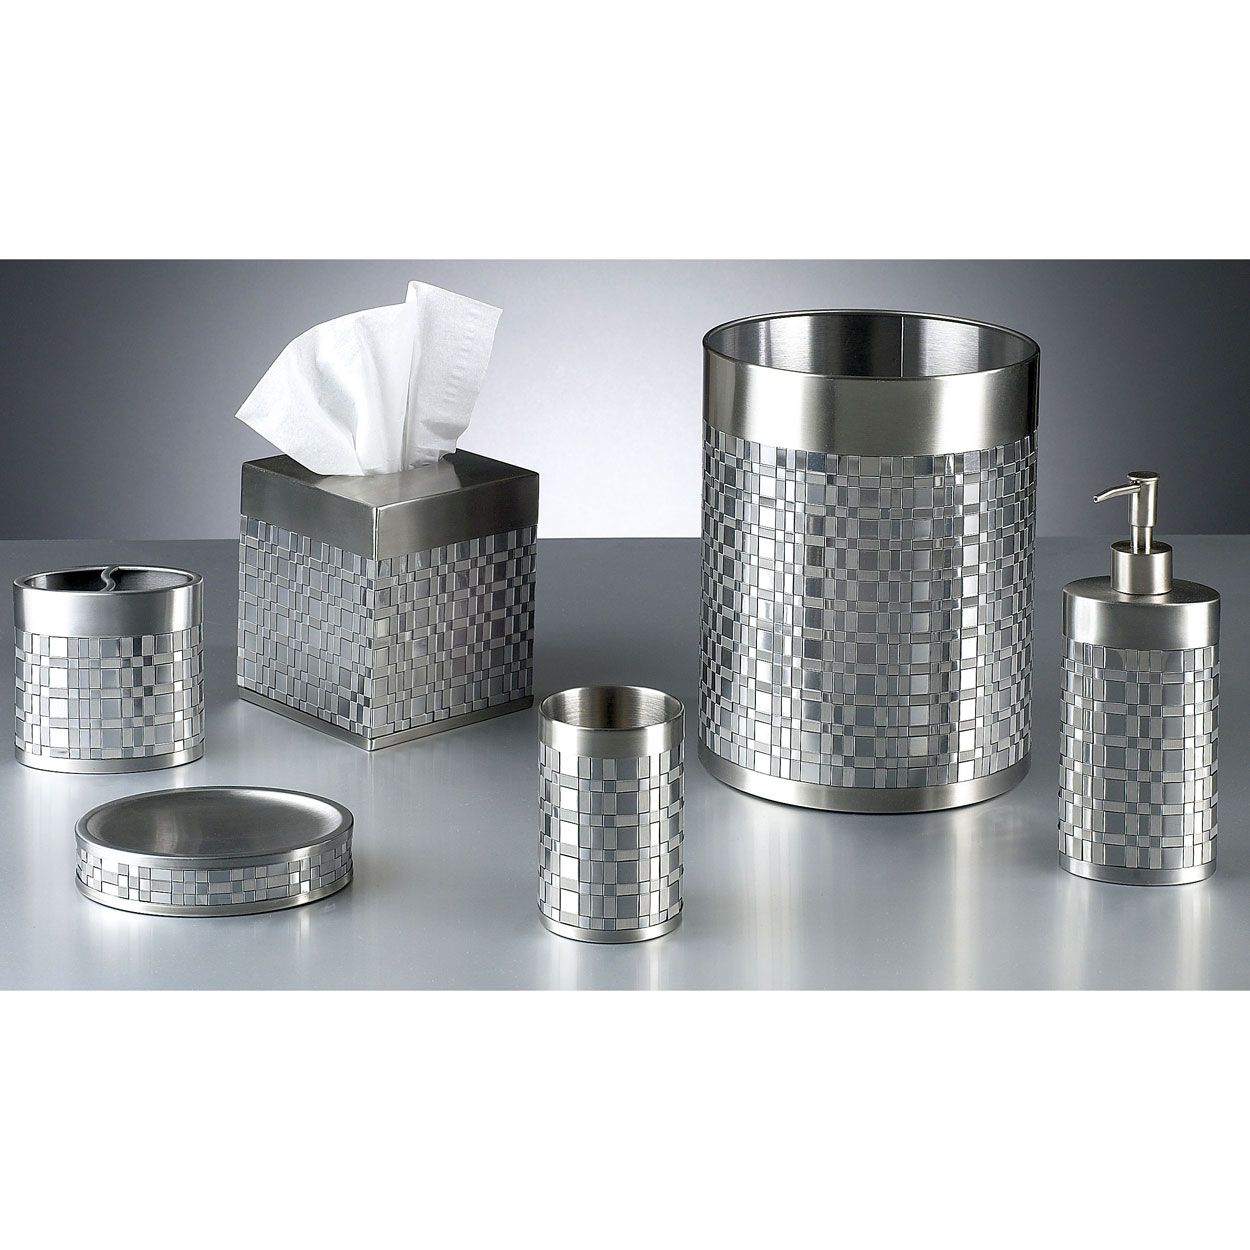 Luxury Bathroom Accessories Stainless Steel Bath Accessories That